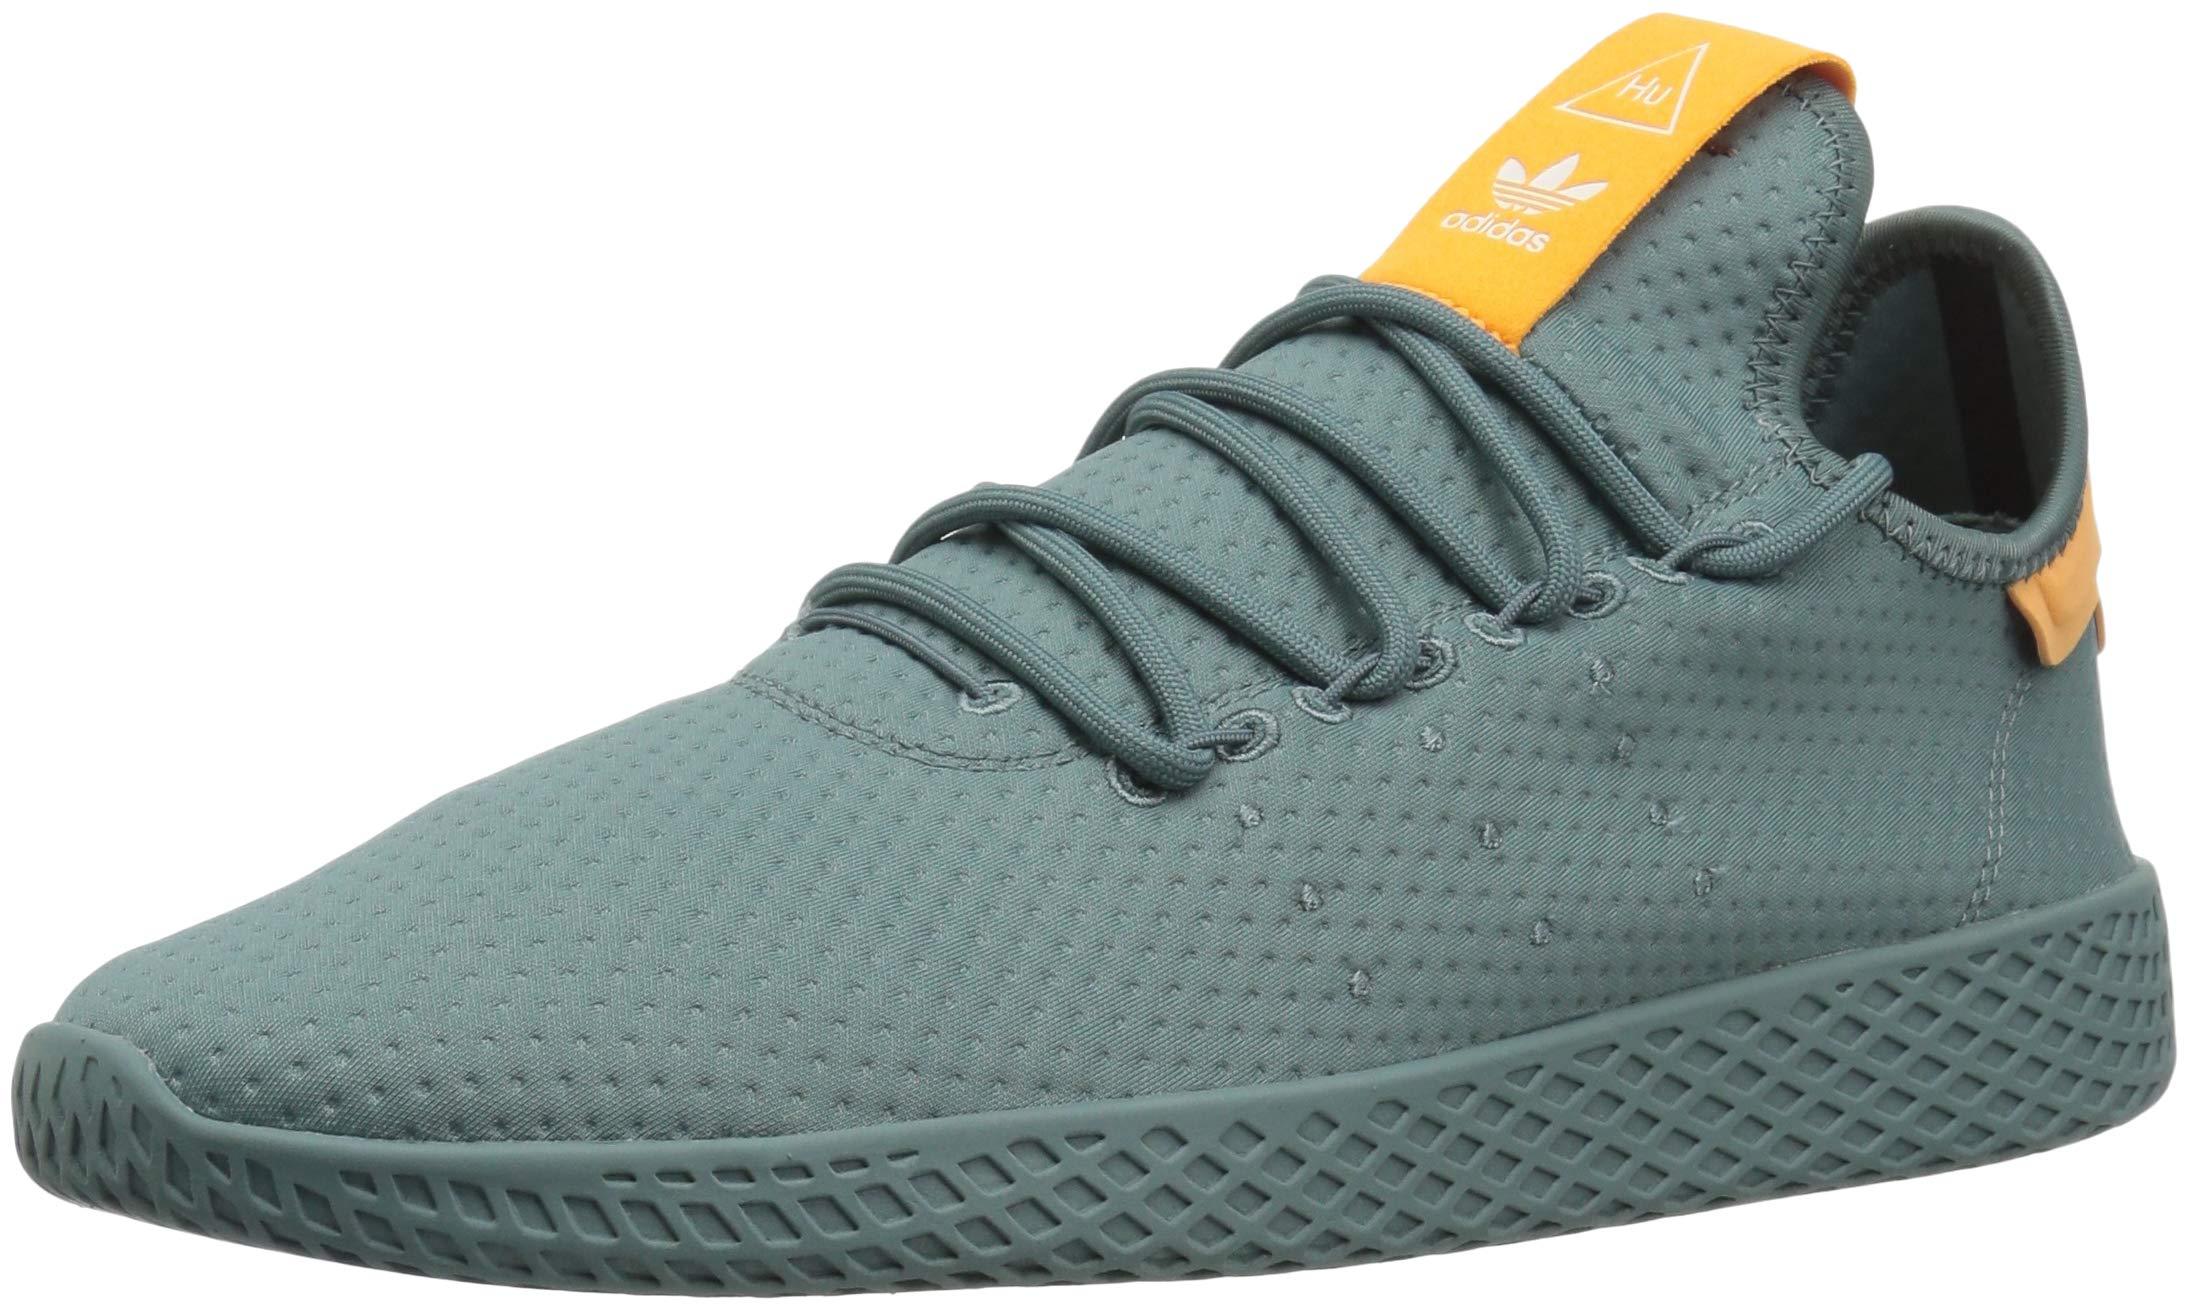 adidas Originals Men's Pharrell Williams Tennis HU Running Shoe, raw Green/Off White, 4 M US